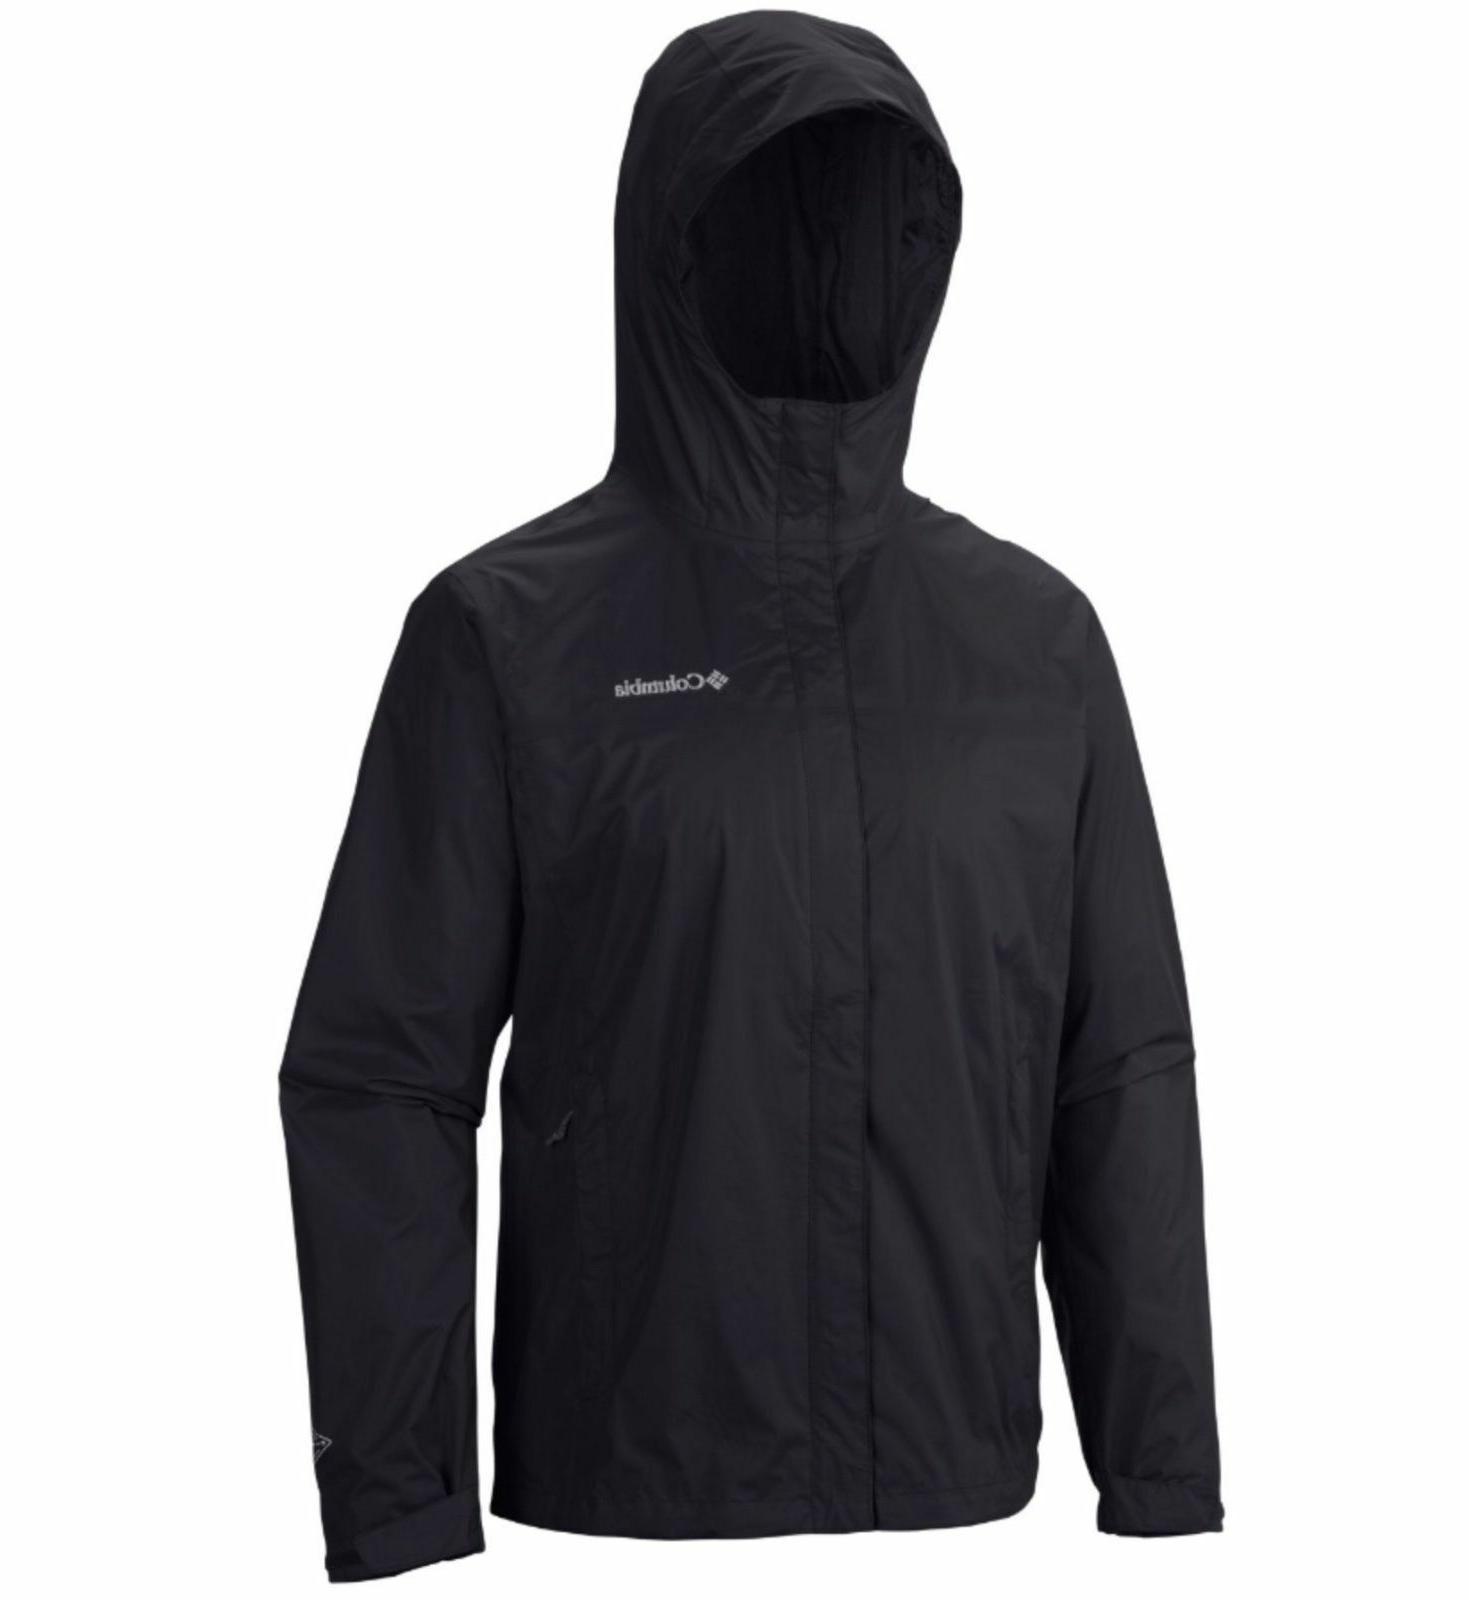 New mens Pointe waterproof rain jacket coat Tall